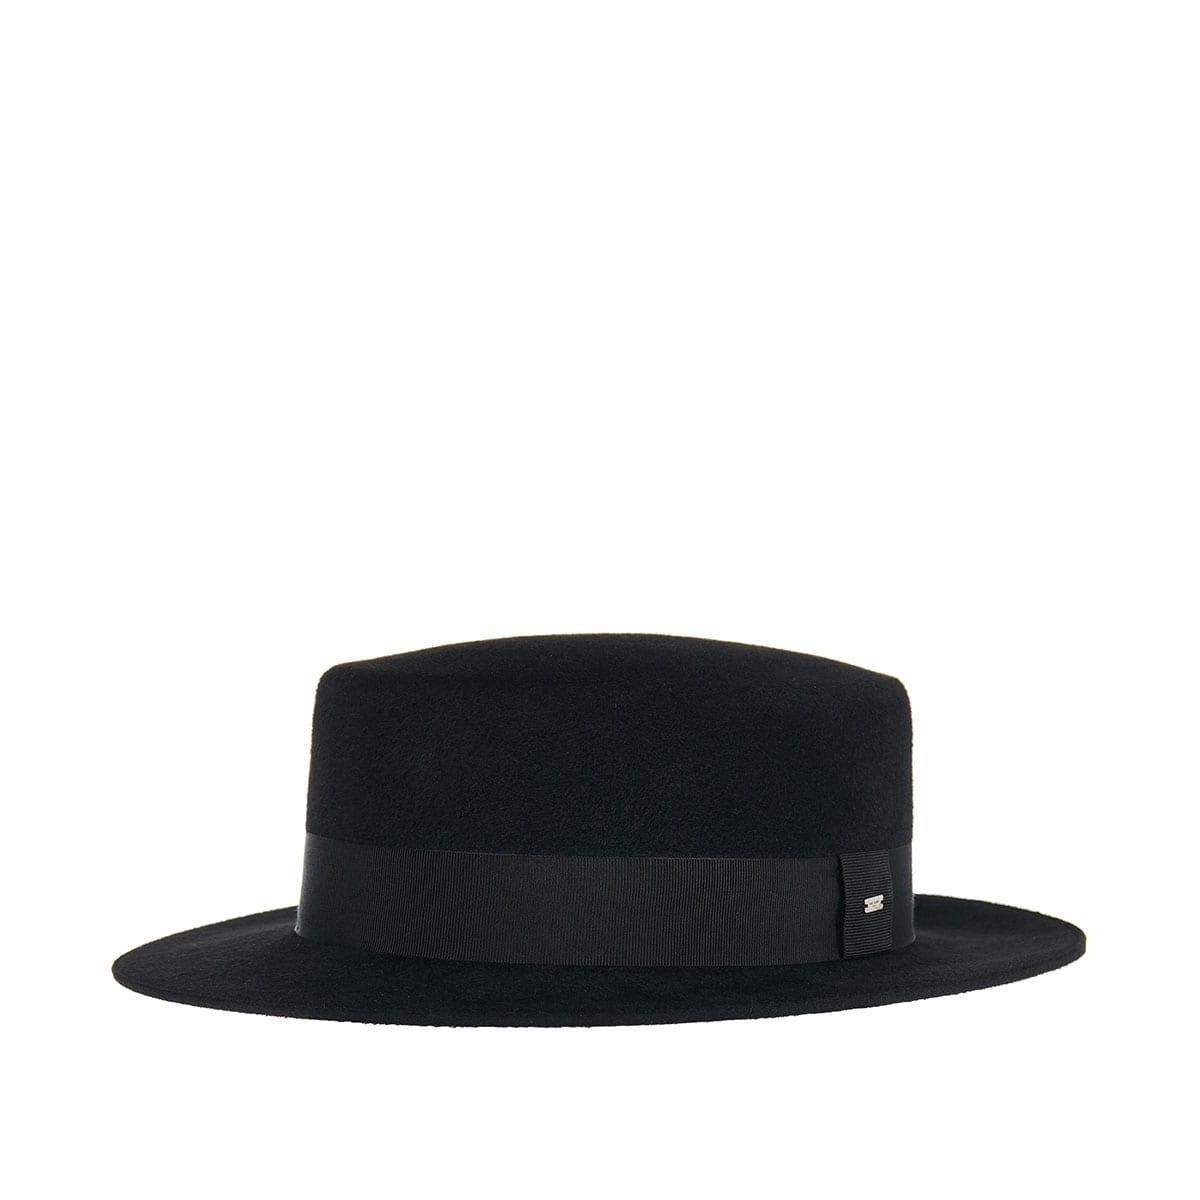 Felt canotier hat